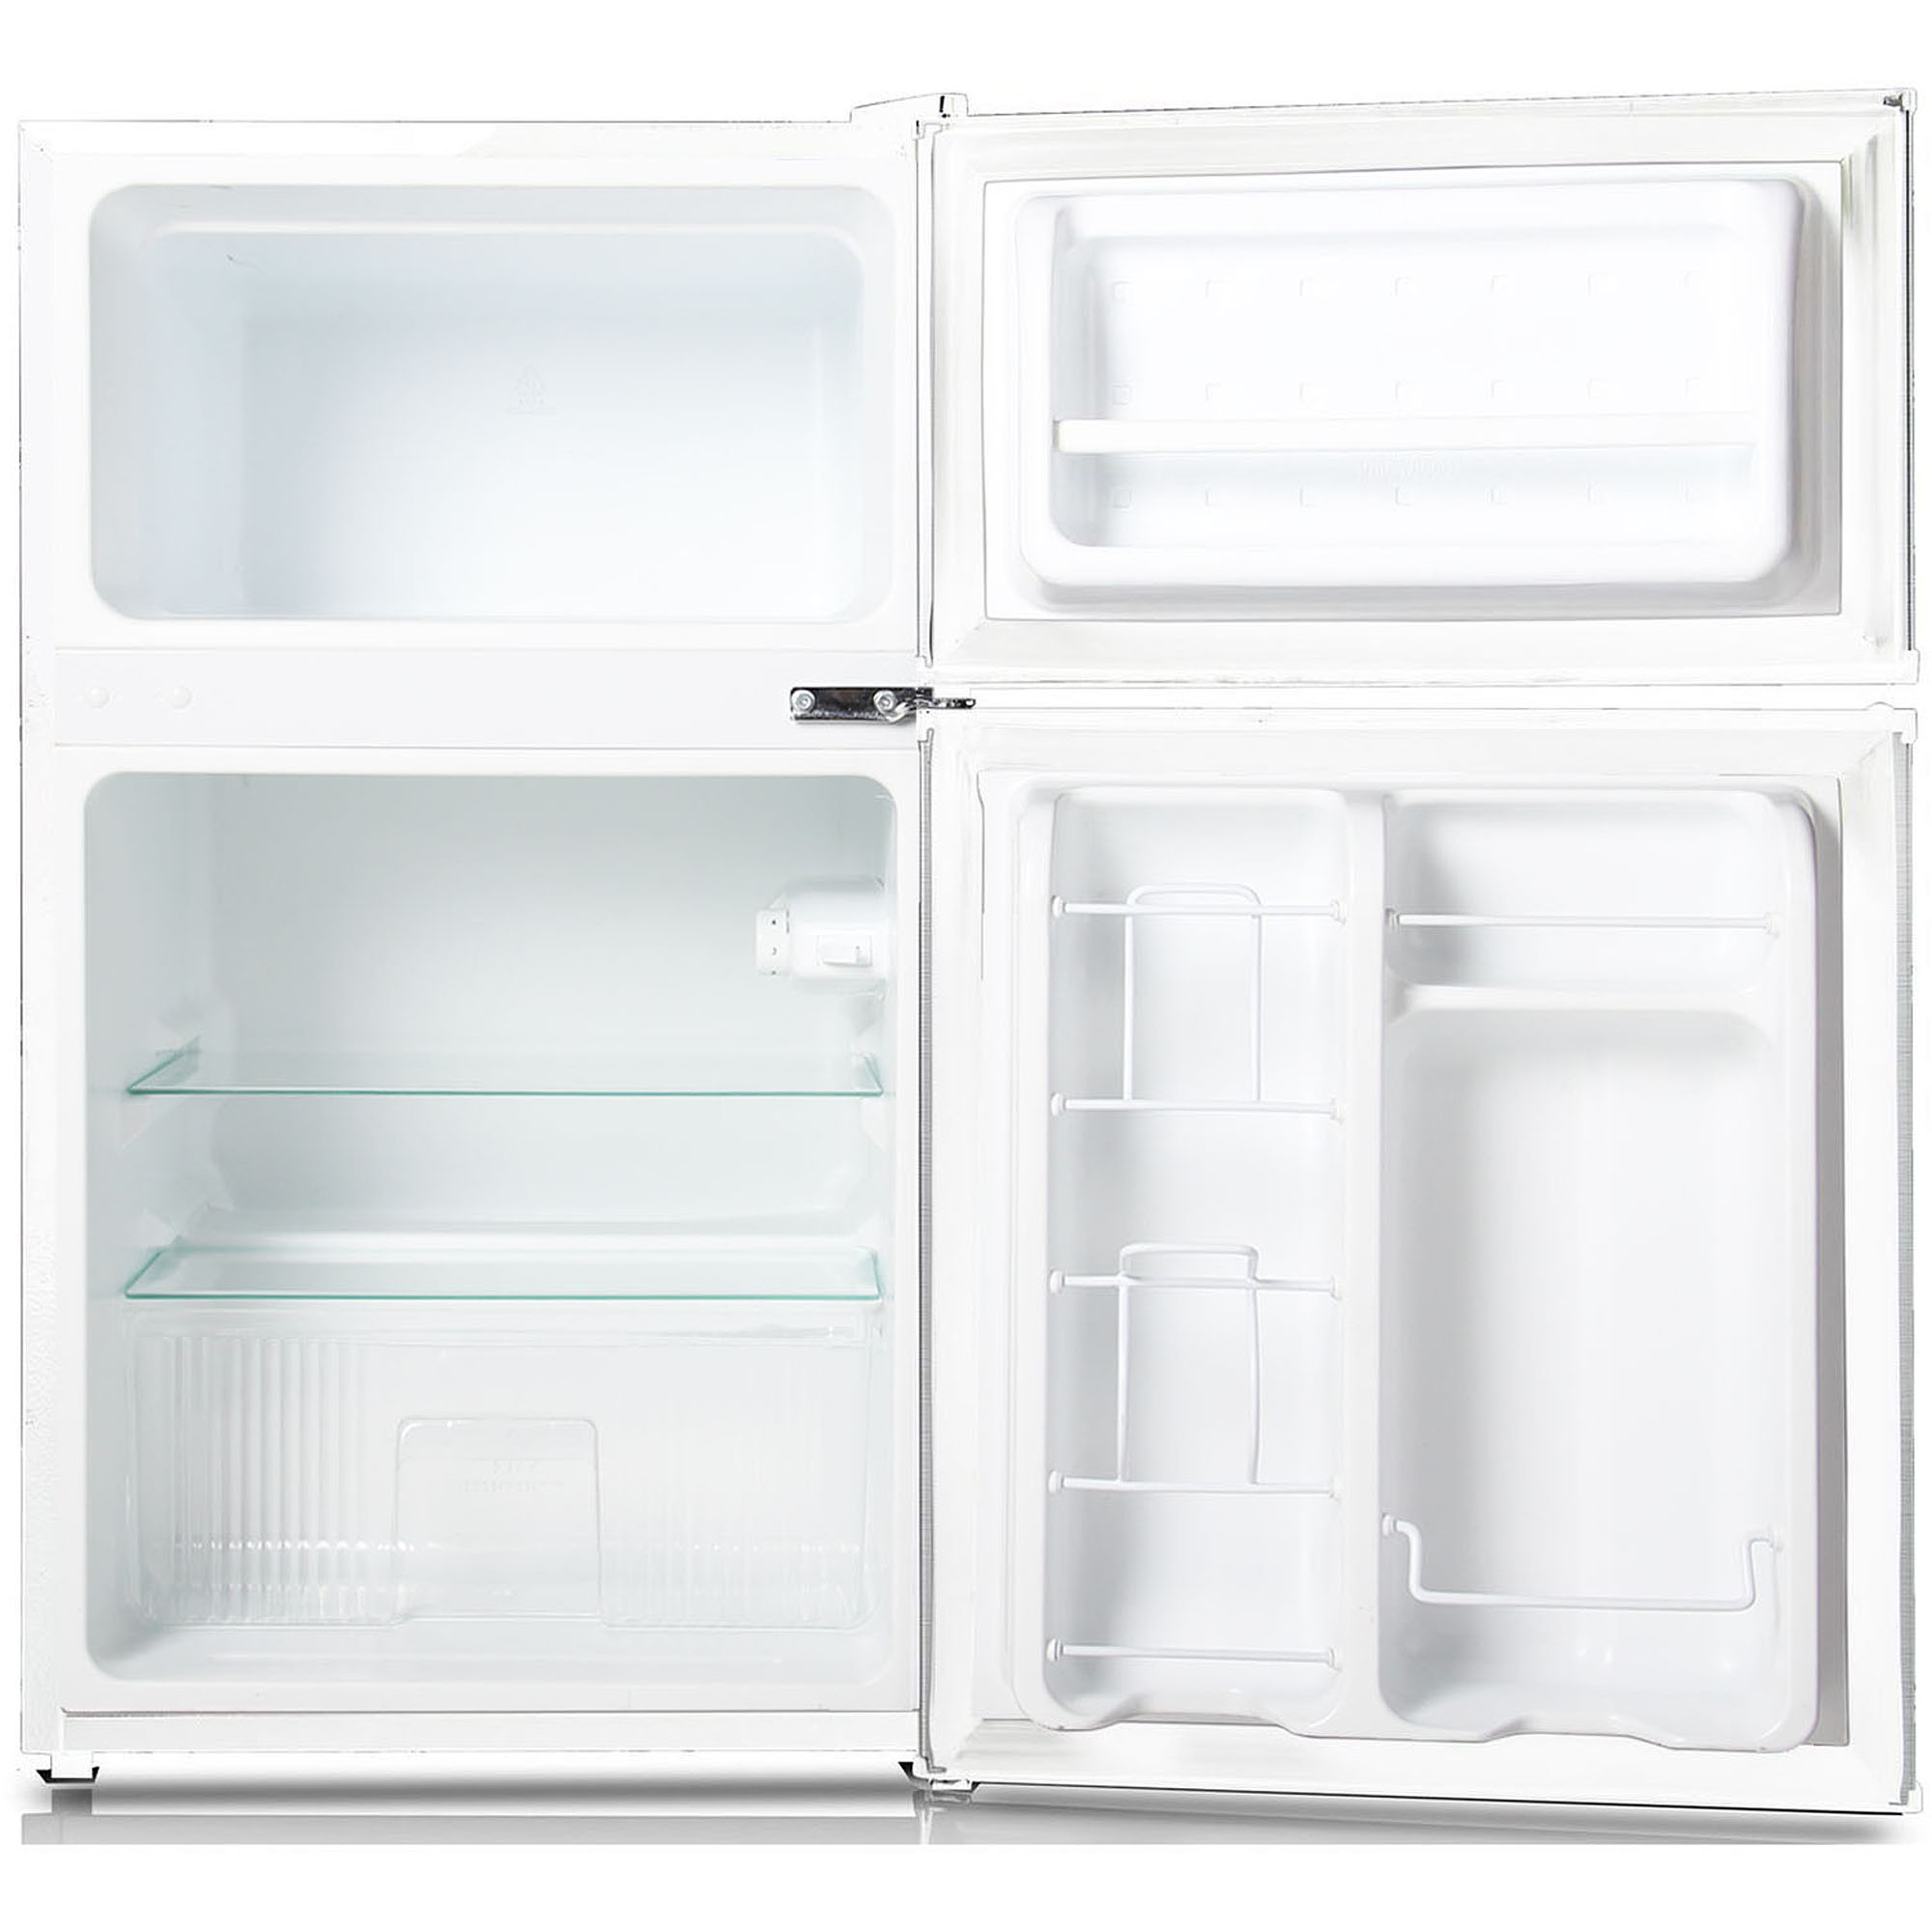 Ft. Compact 2 Door Refrigerator/Freezer, White, KSTRC312CW   Walmart.com